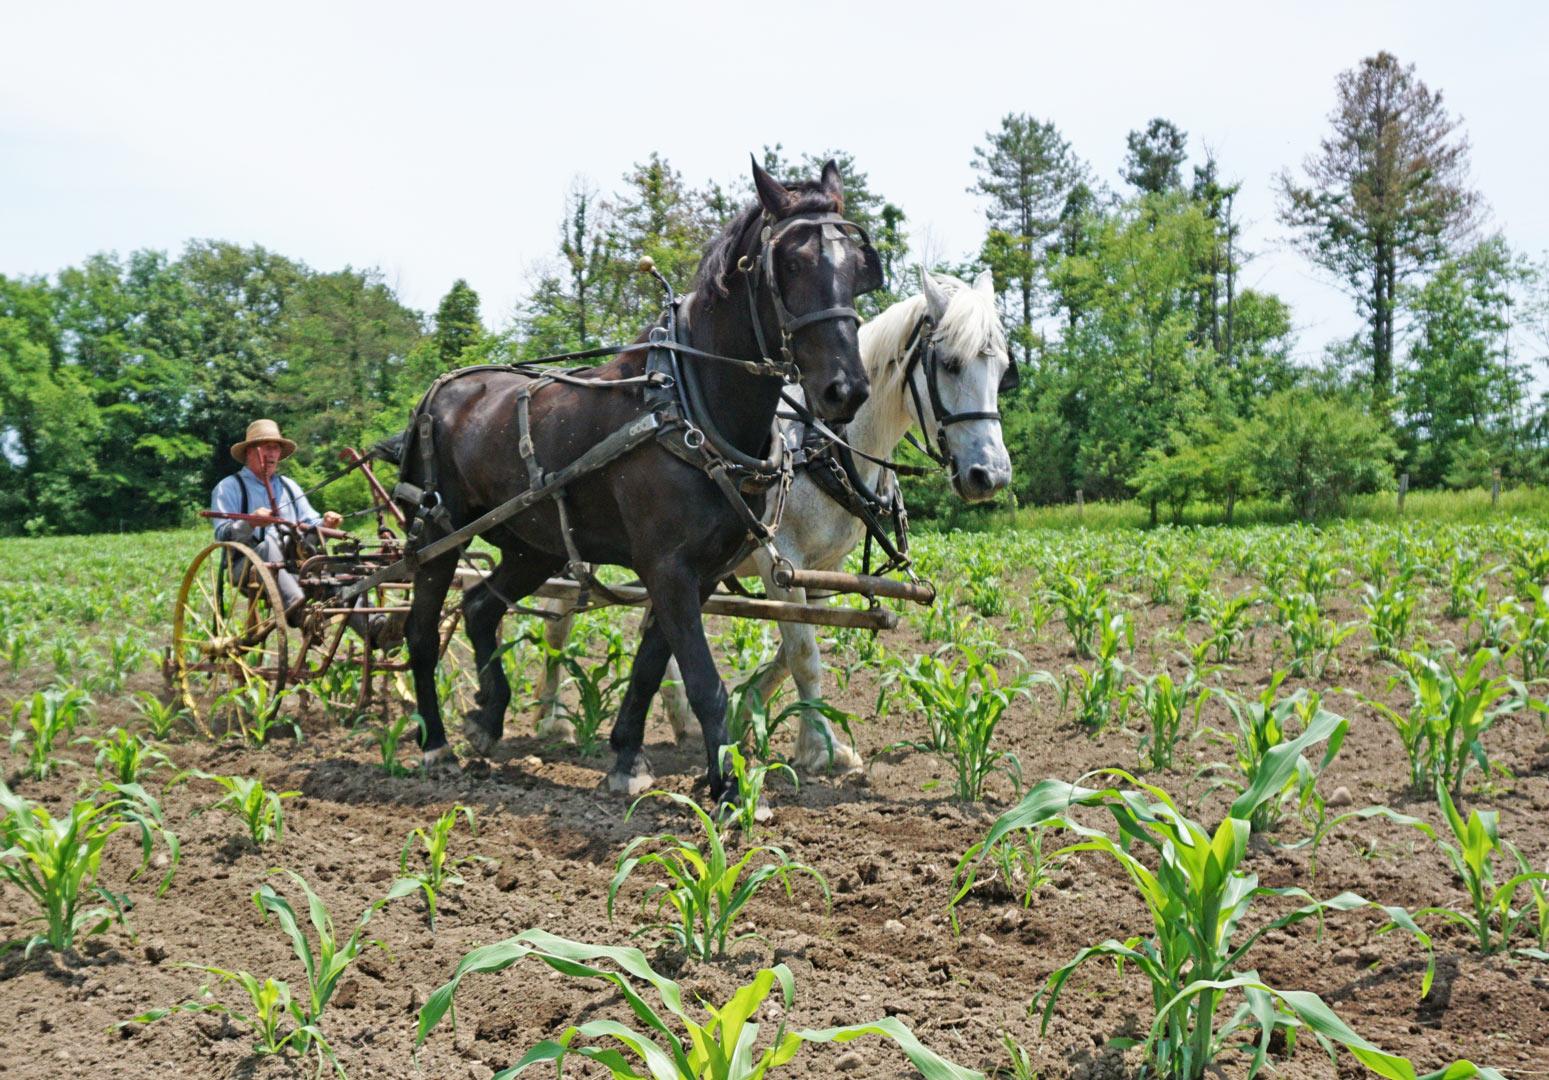 Bob and partner cultivating corn at Slate Run Farm